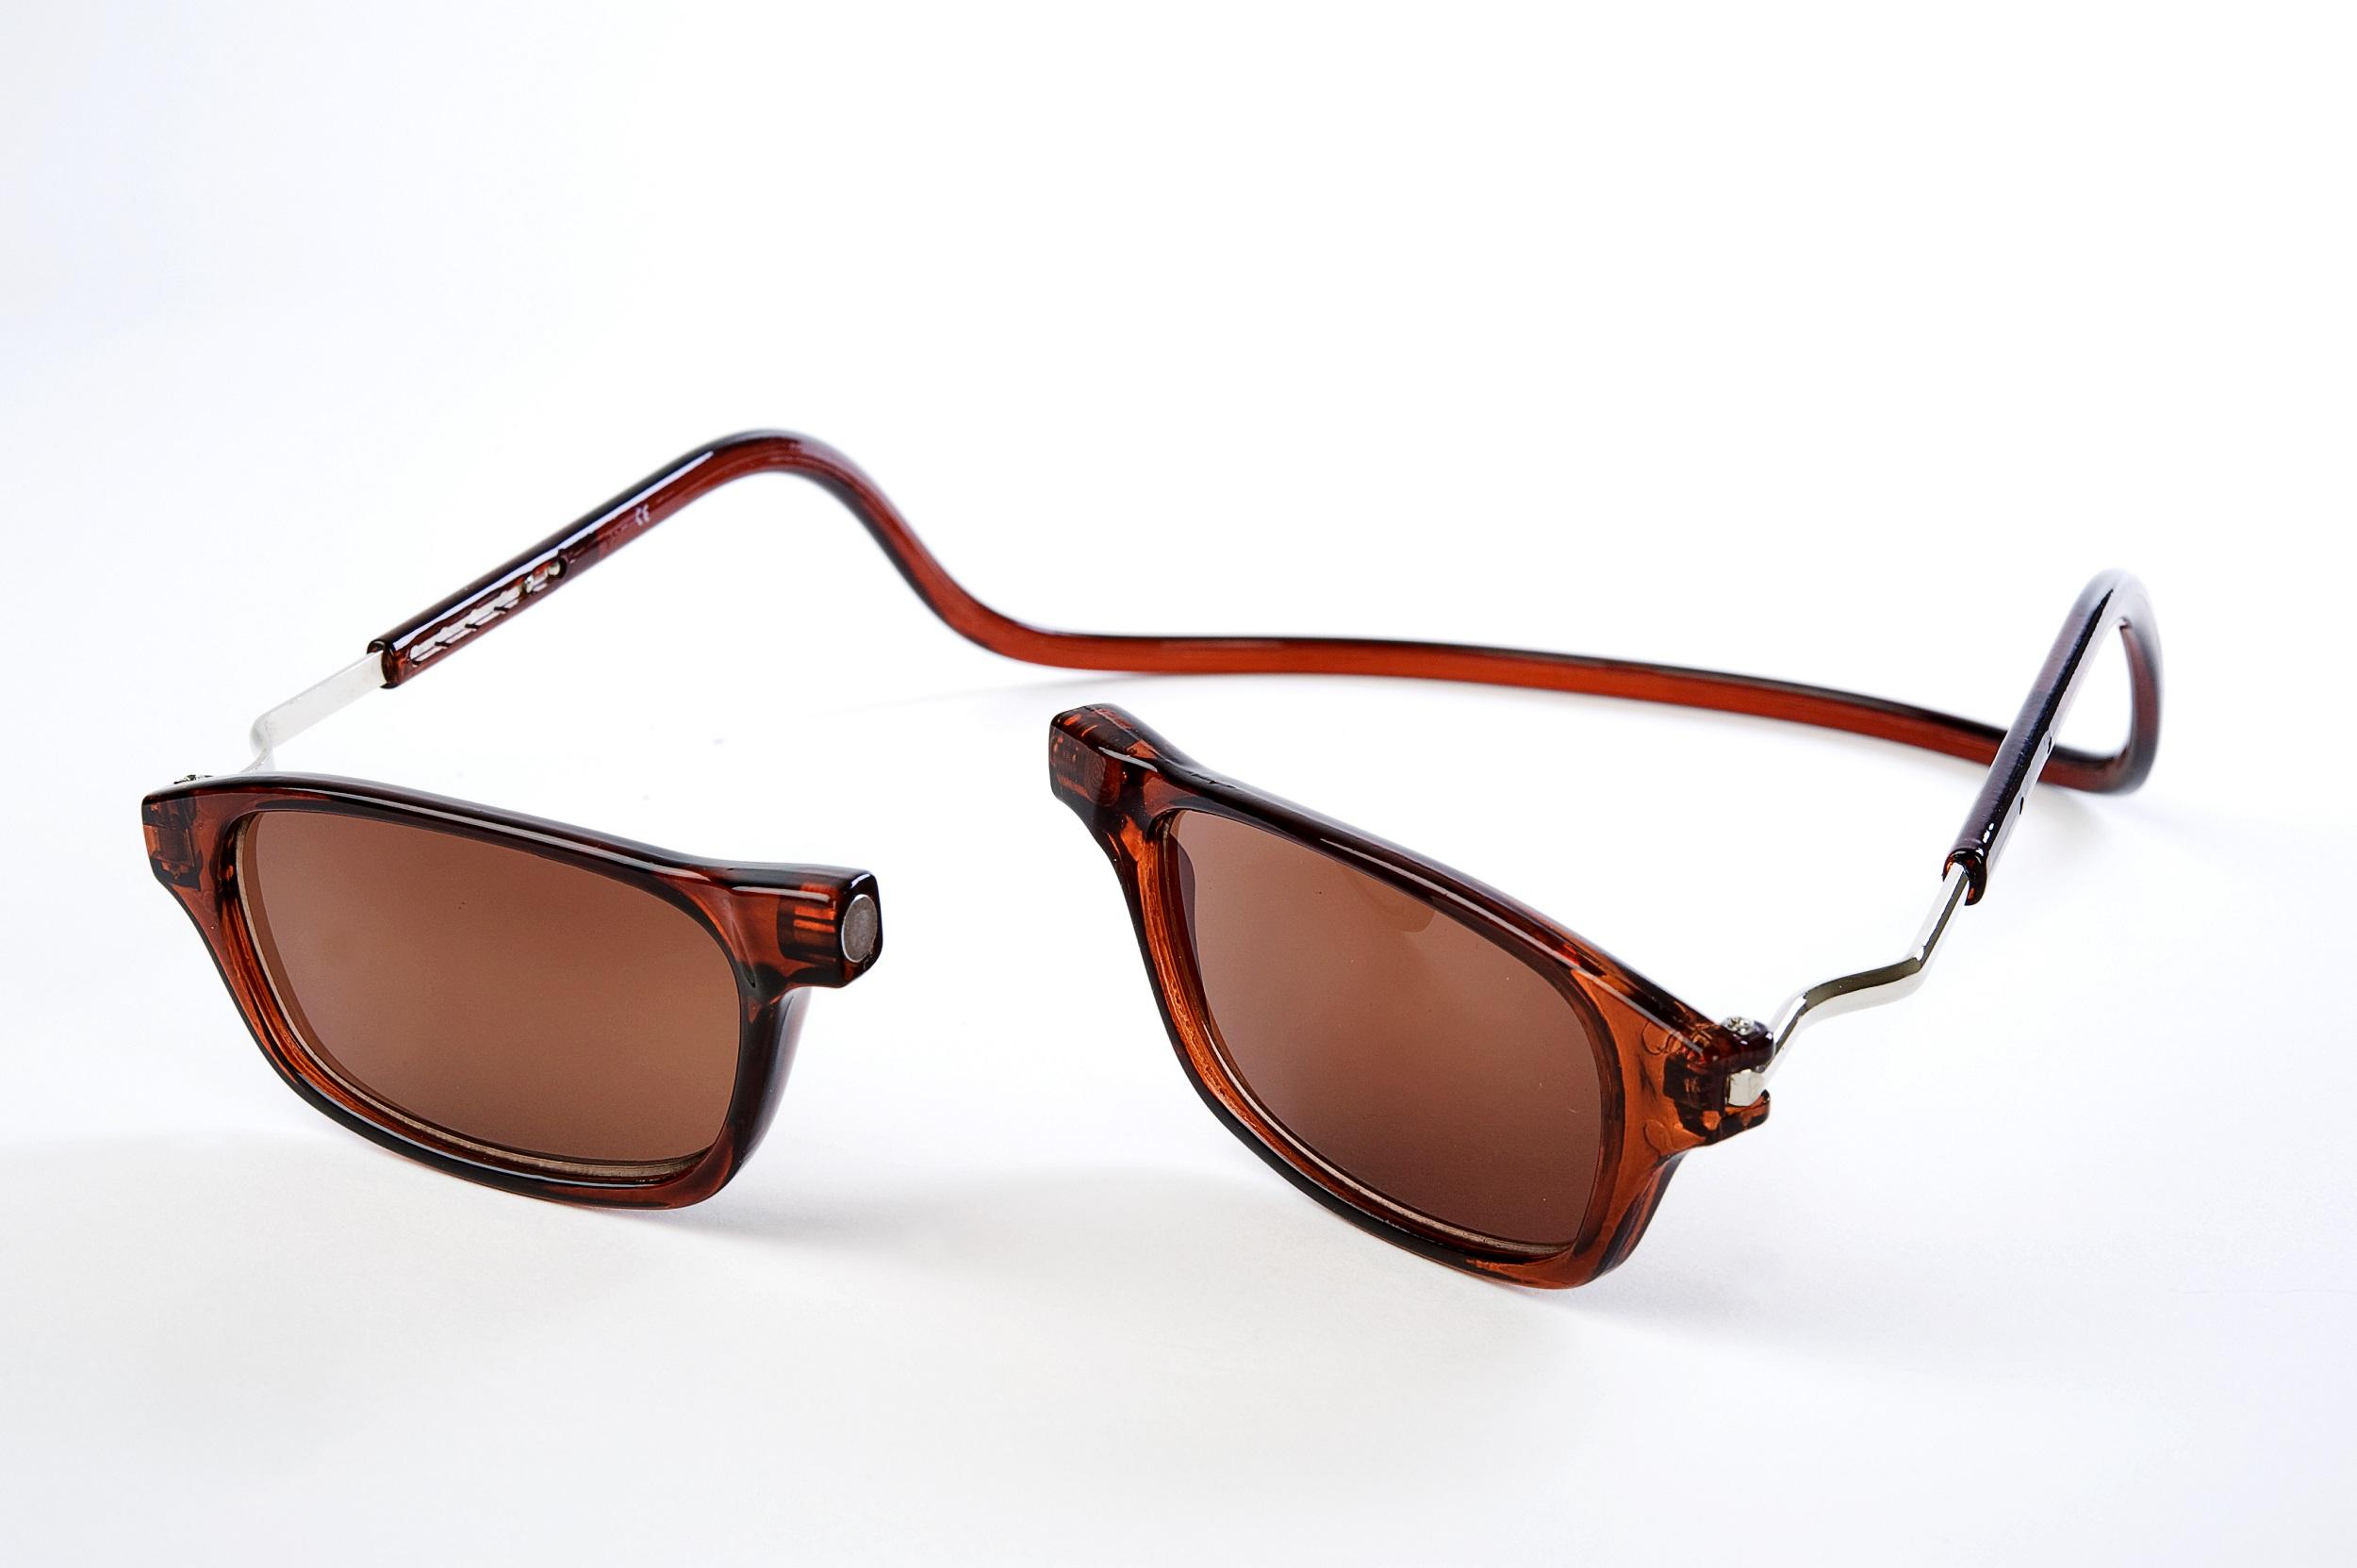 Easy Reader magneetleesbril leesbril met magneetsluiting model Classic XL zon zwart